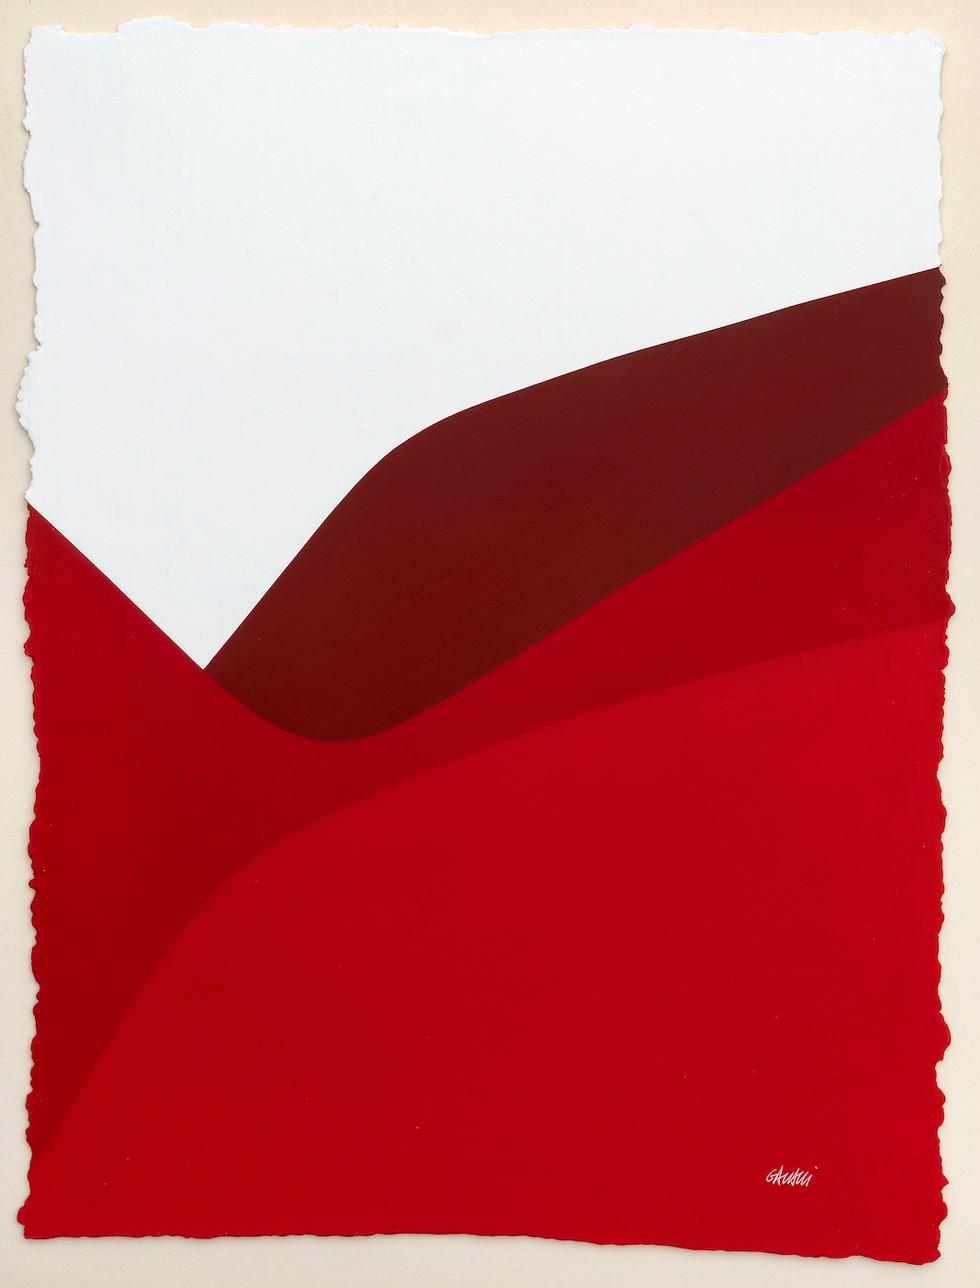 Lignes urbaines rouge 3 2019 Acryl auf handgeschöpftem Papier 52 x 38 cm